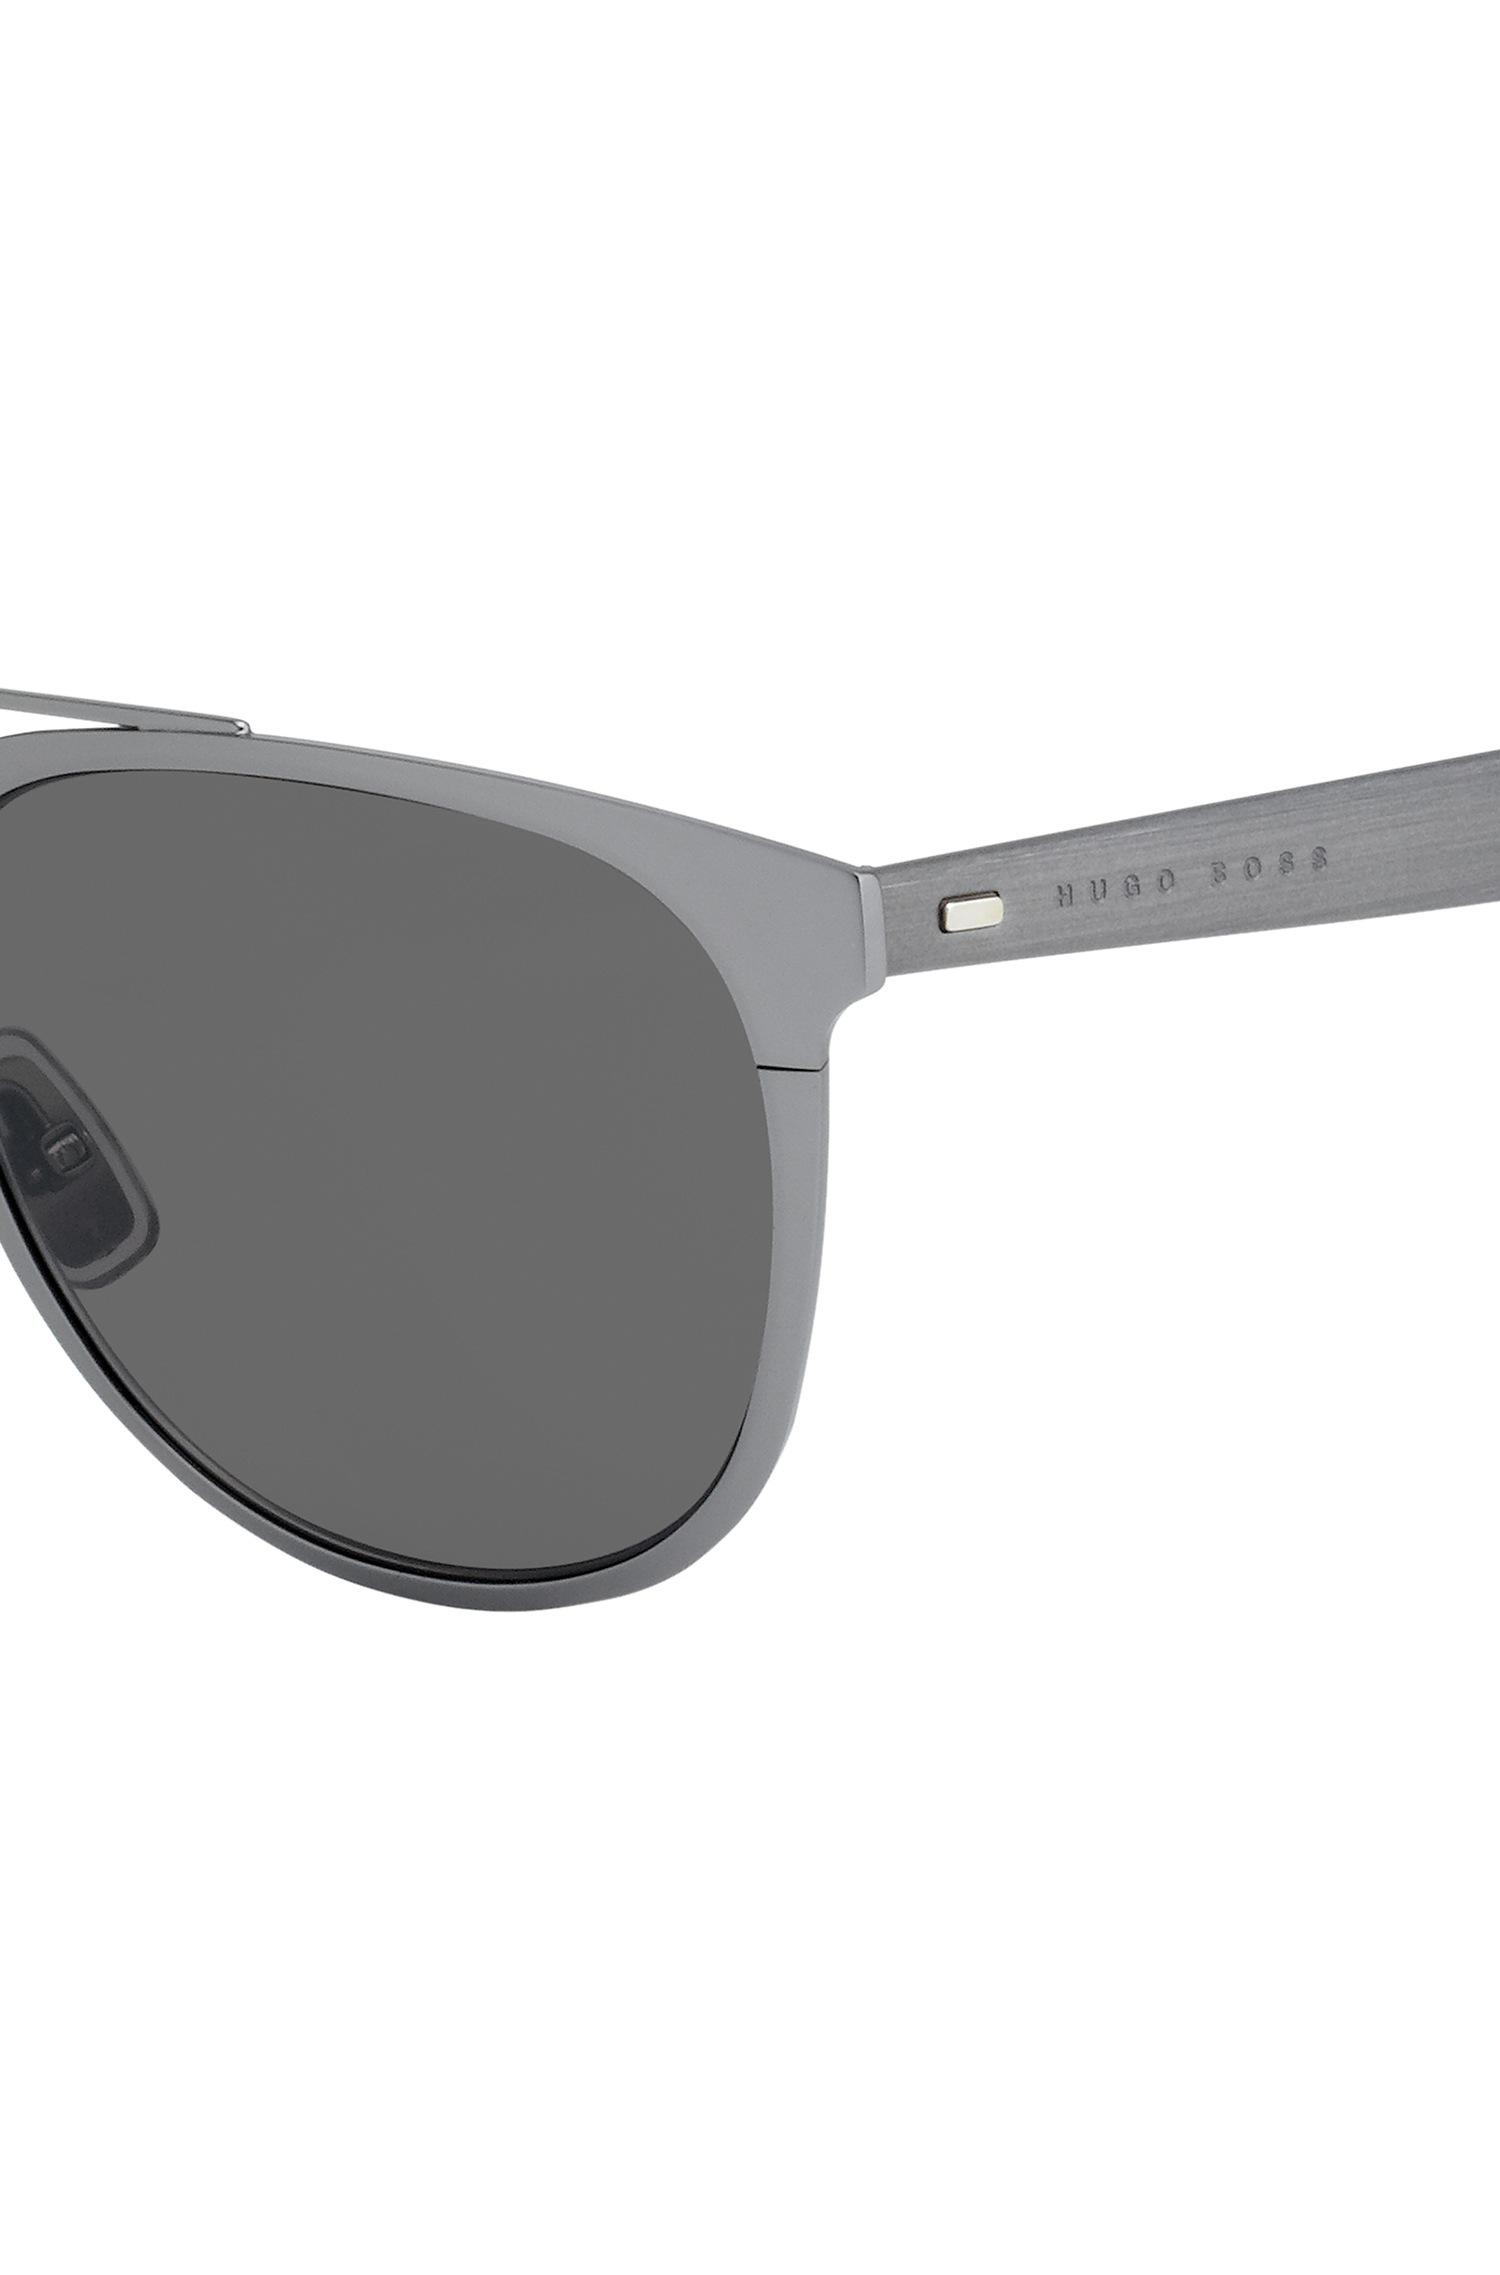 5ae9db21ac BOSS - Metallic Dark Grey Metal Sunglasses With Cork Trim for Men - Lyst.  View fullscreen